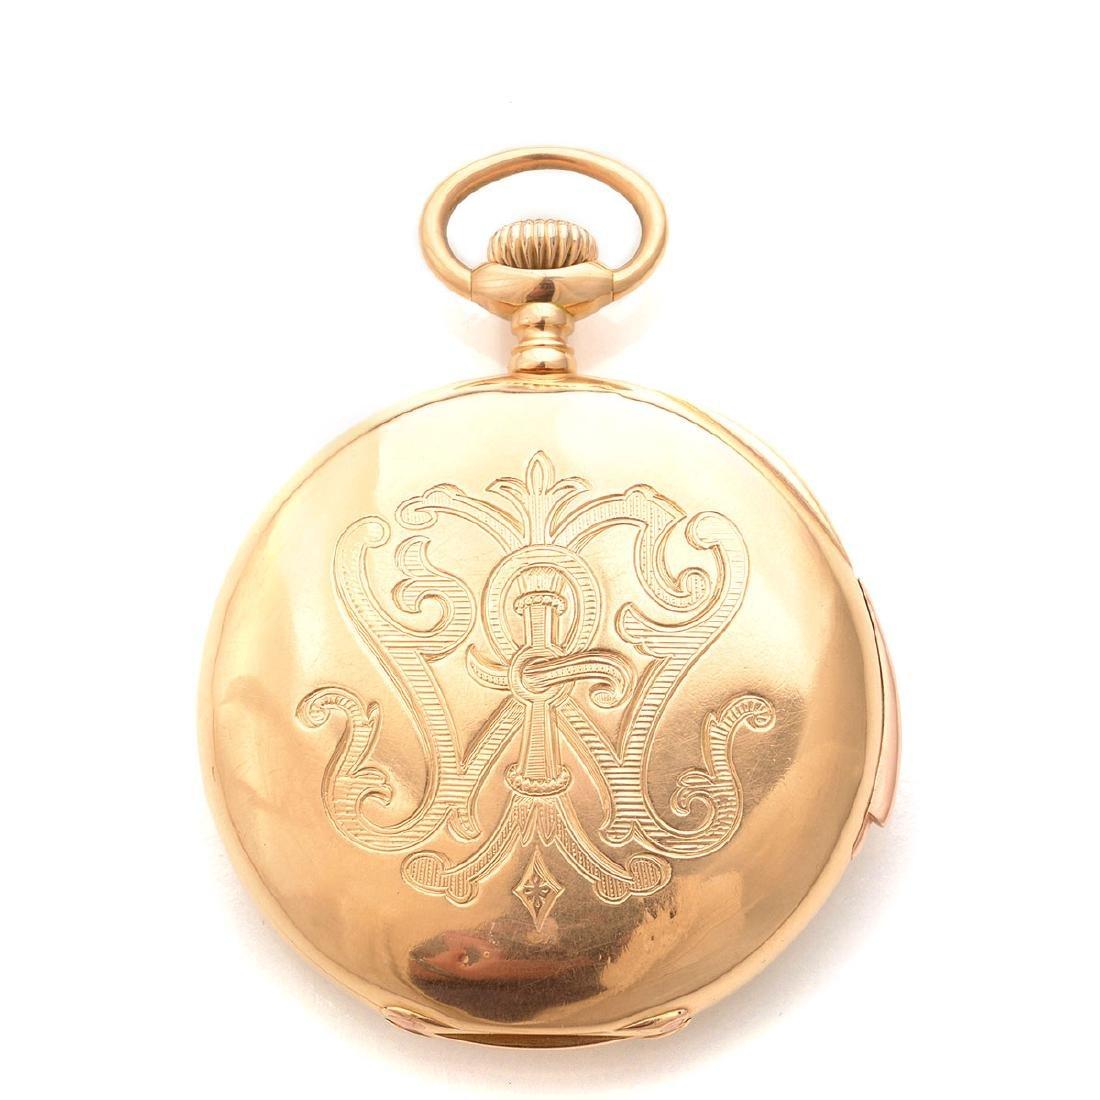 W.K. Vanderslice & Co. 18k Yellow Gold Minute Repeater - 2